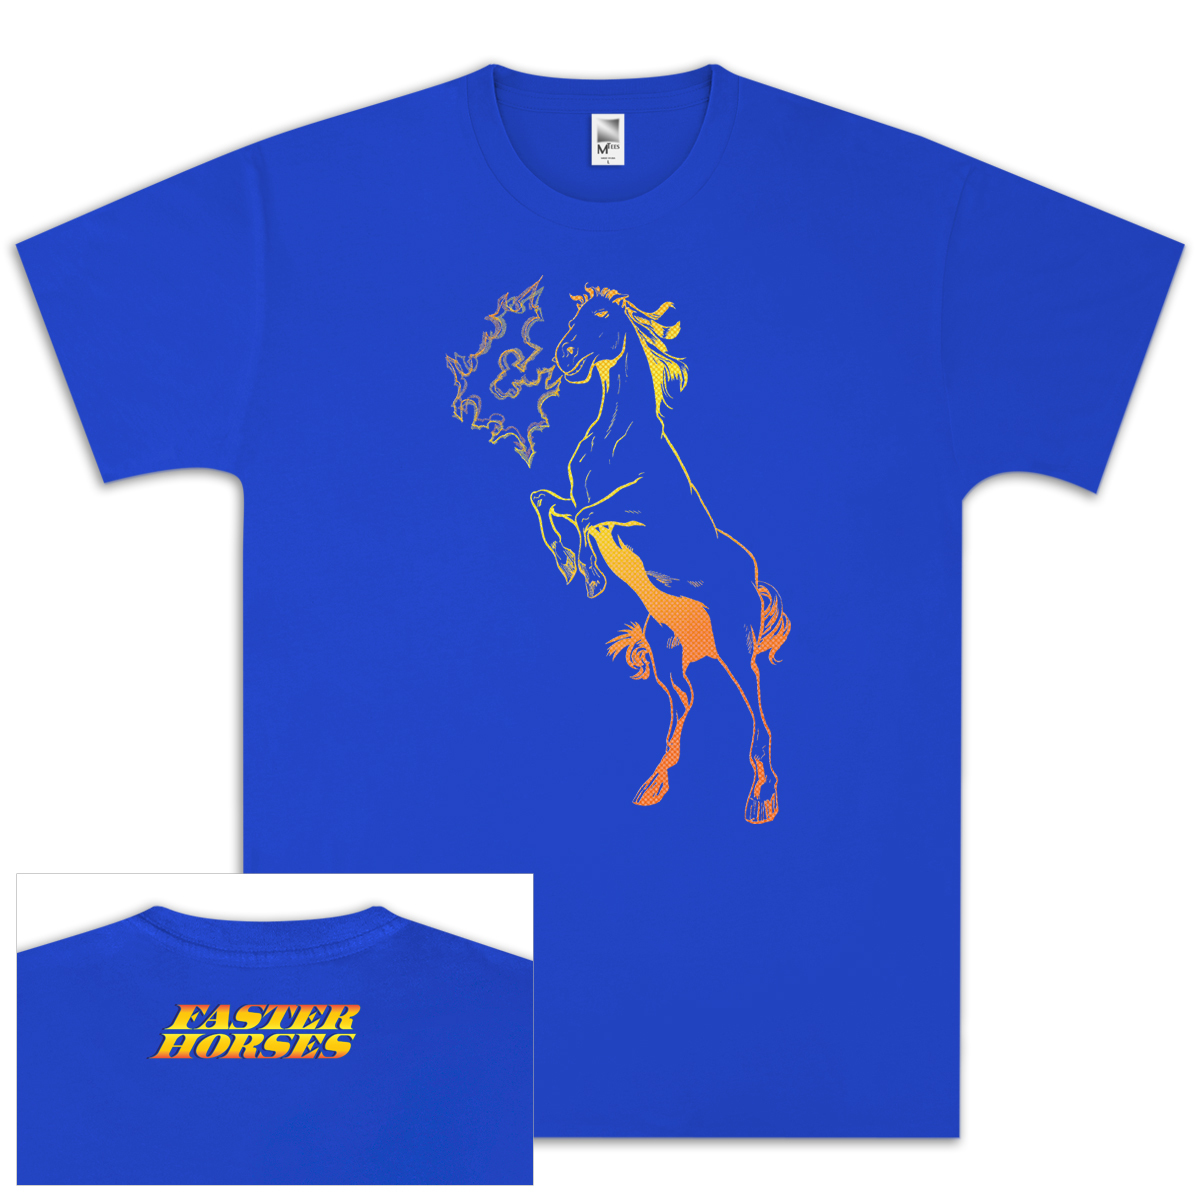 FasterHorses Festival Mustang T-Shirt